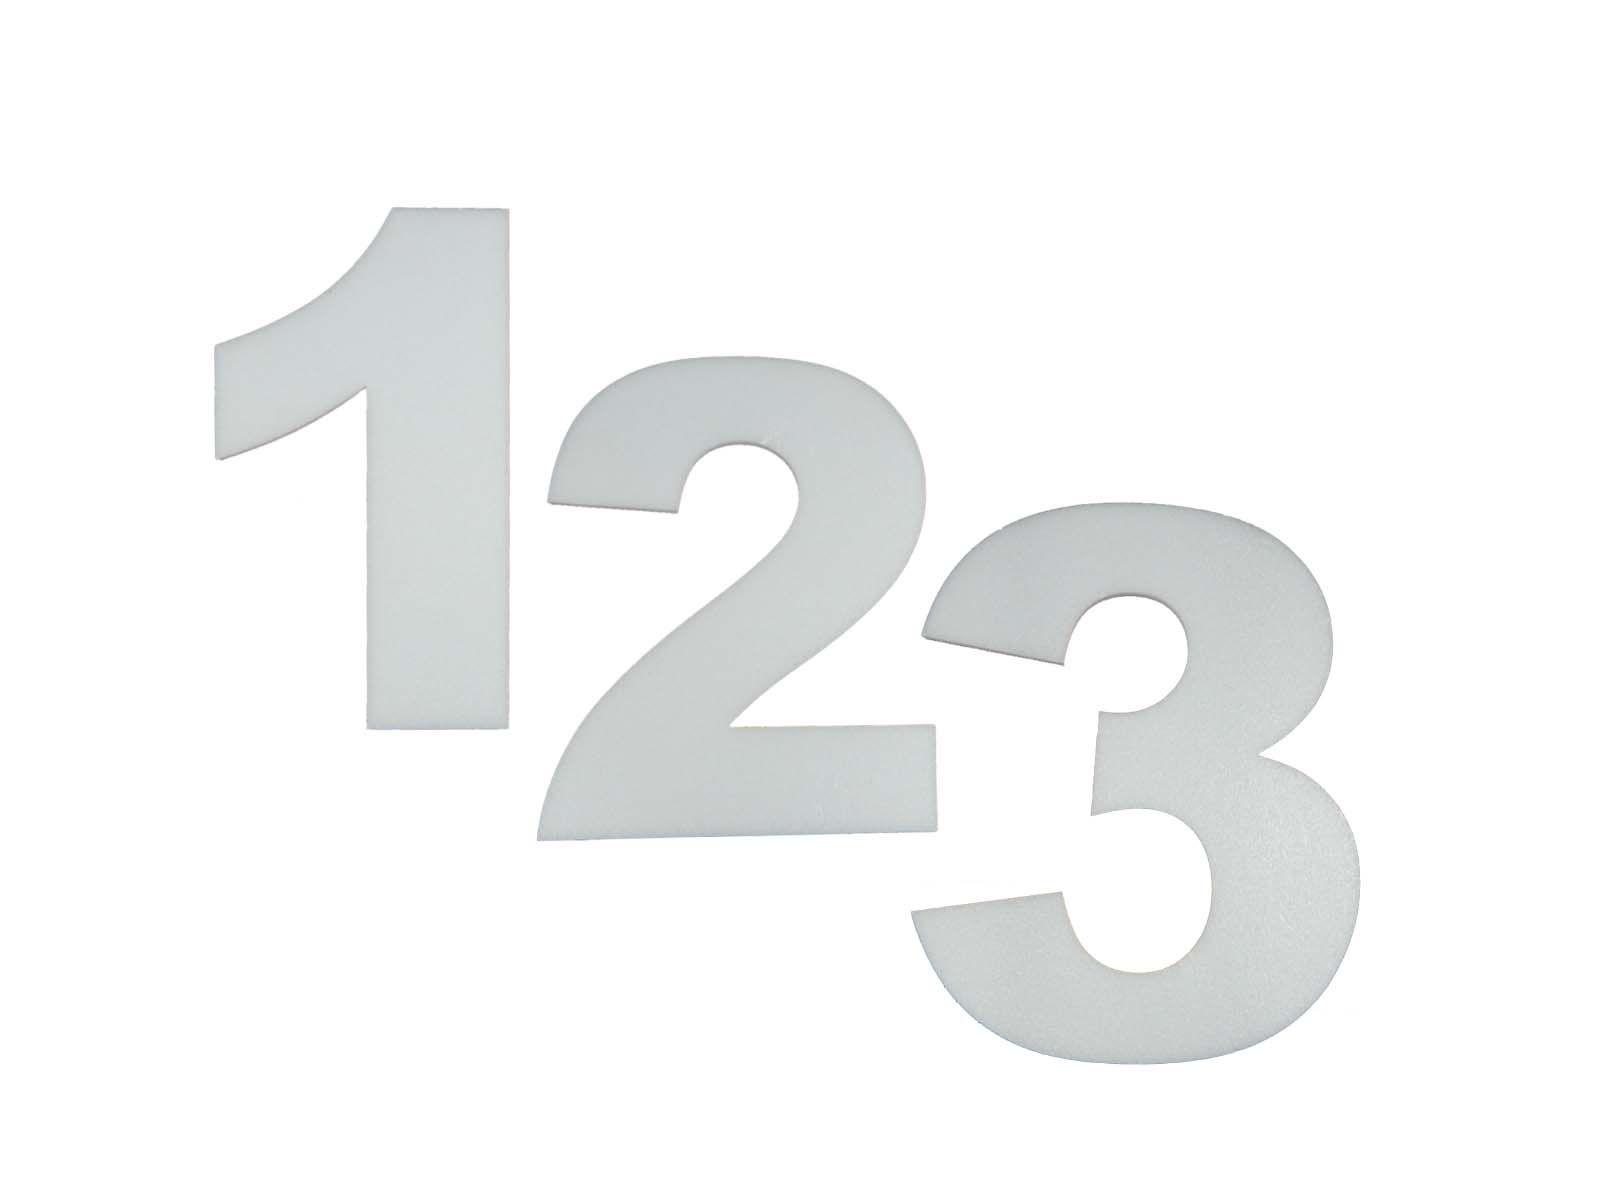 Numero Isopor Depron 10cm